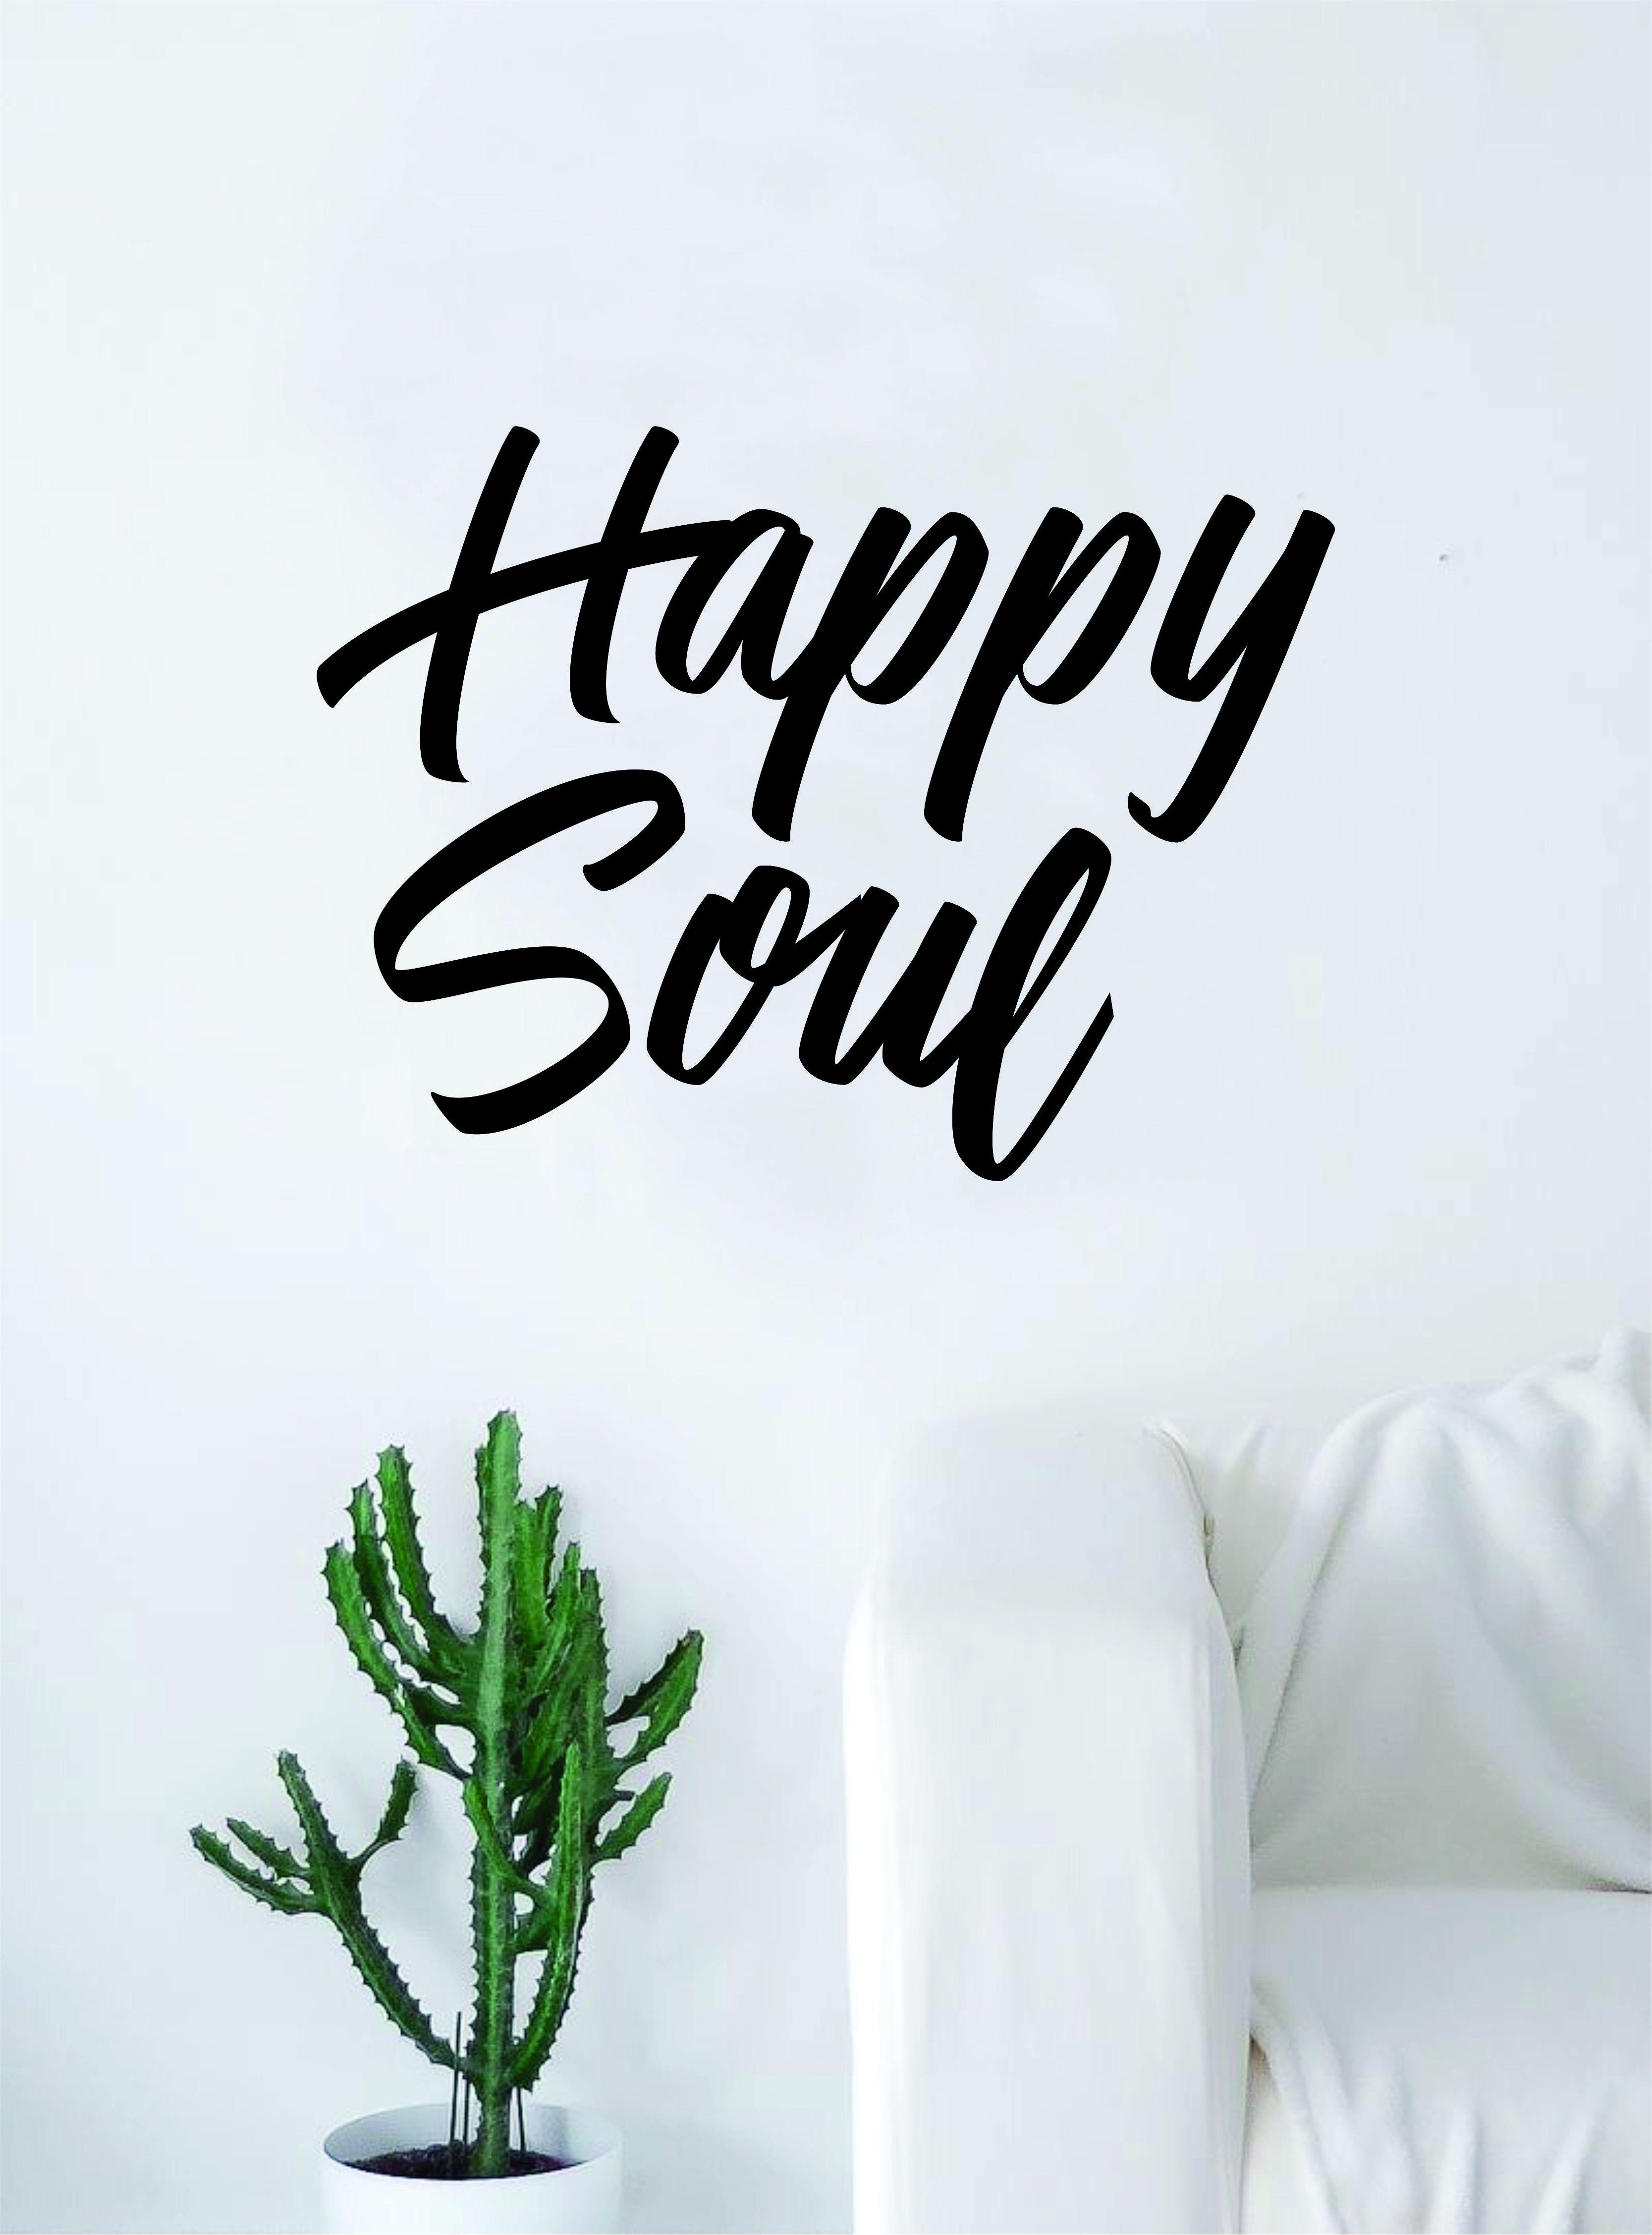 Happy Soul Wall Decal Home Decor Room Bedroom Art Vinyl Sticker Quote Teen Kids Baby Girls Inspirational Yoga - brown